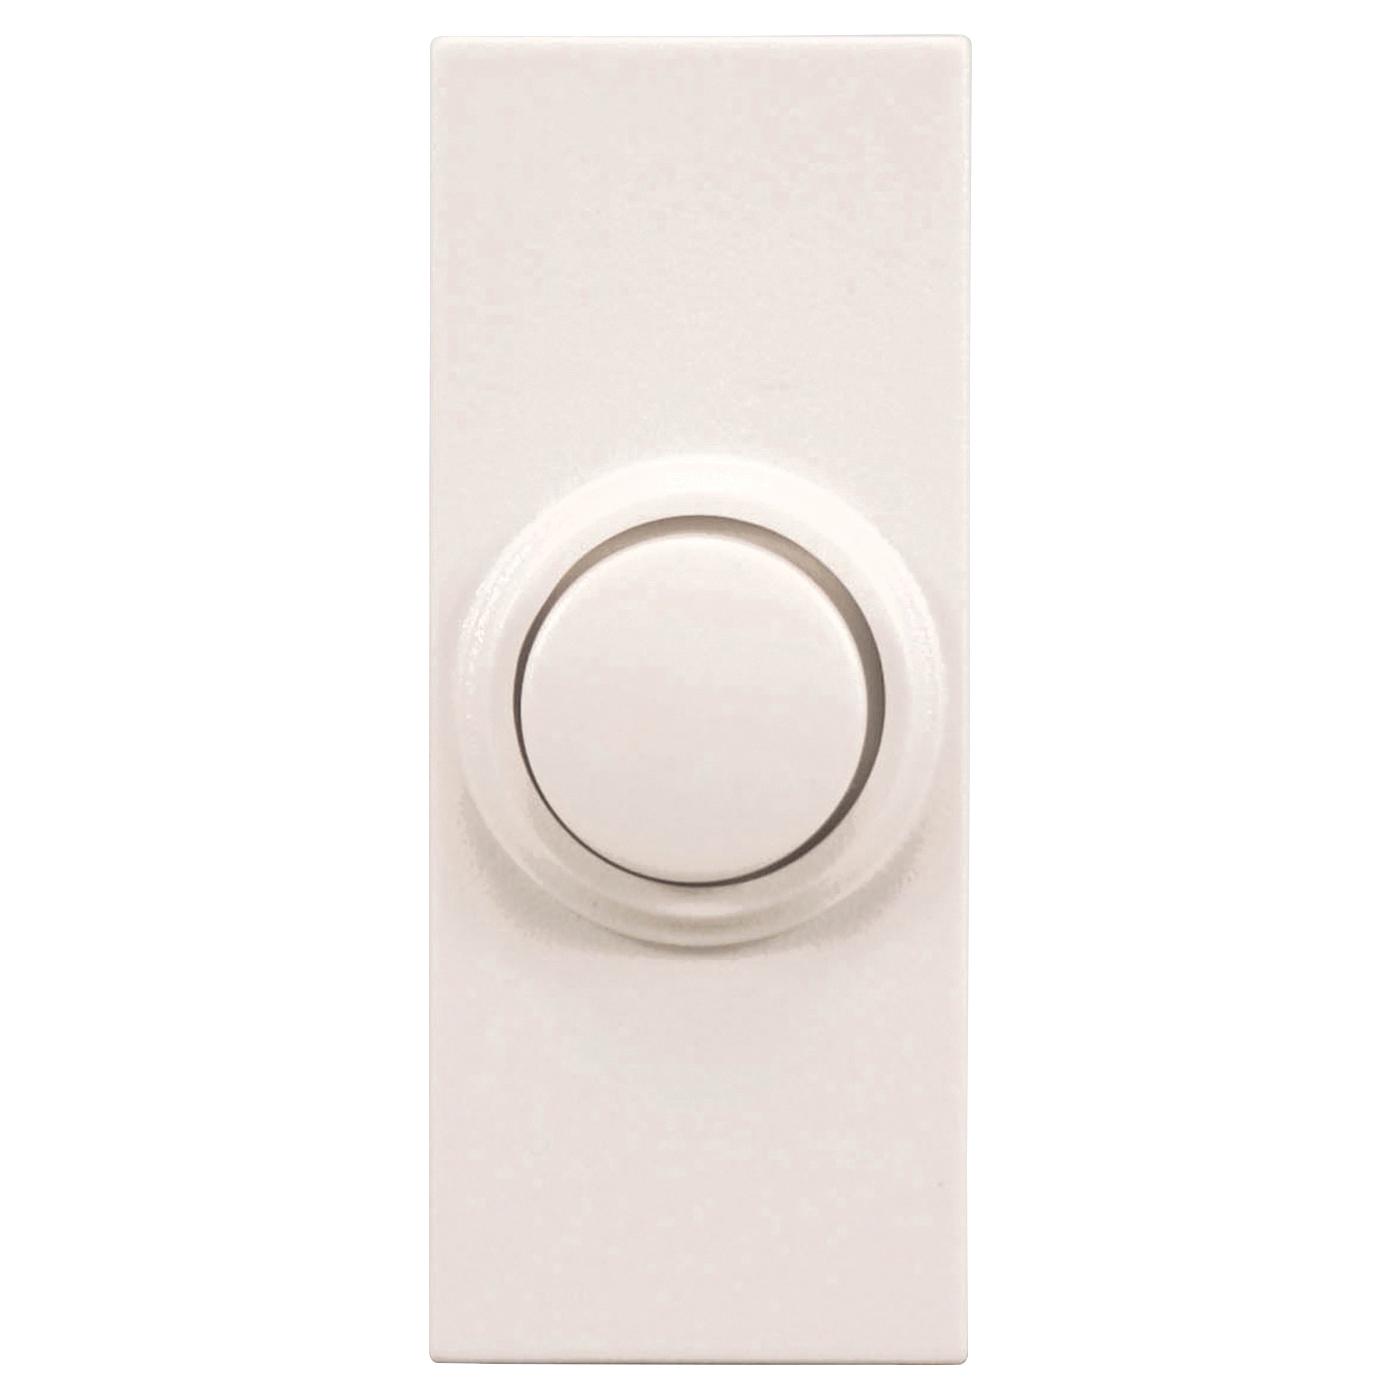 Picture of Heath Zenith SL-7393-02 Pushbutton, Round, Wireless, Push Button, Plastic, White